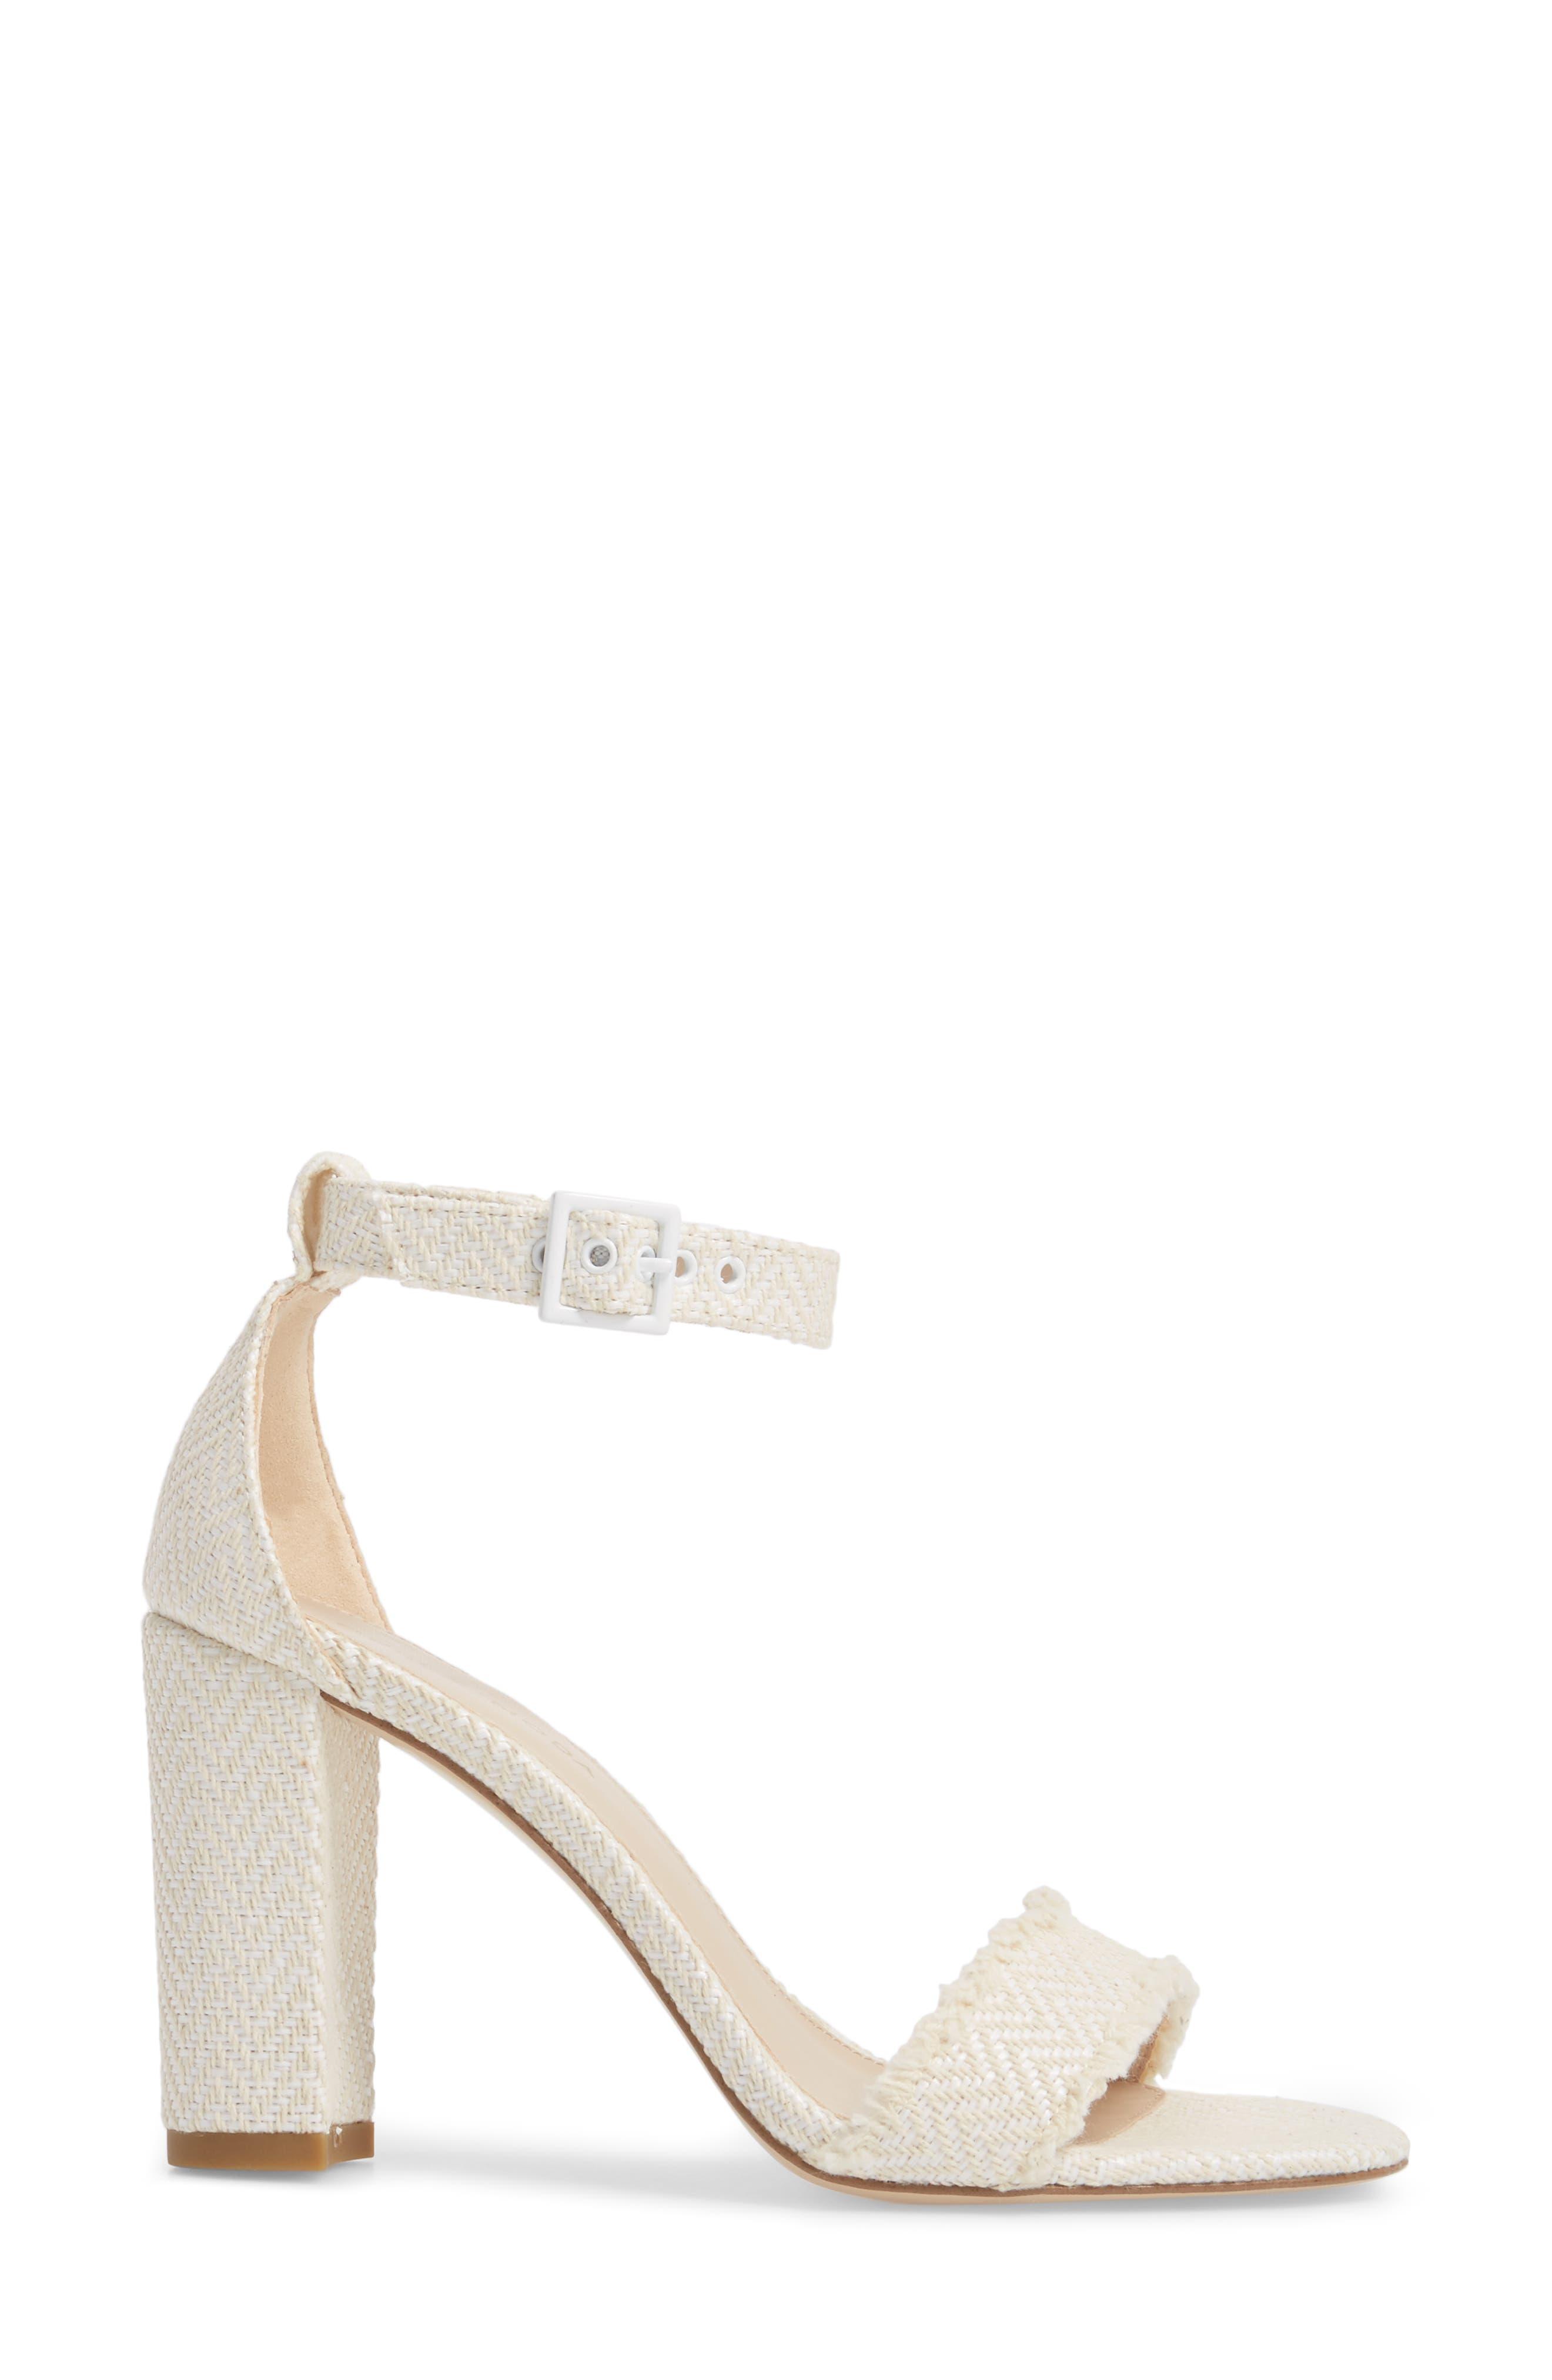 Bonnie Ankle Strap Sandal,                             Alternate thumbnail 3, color,                             White Herringbone